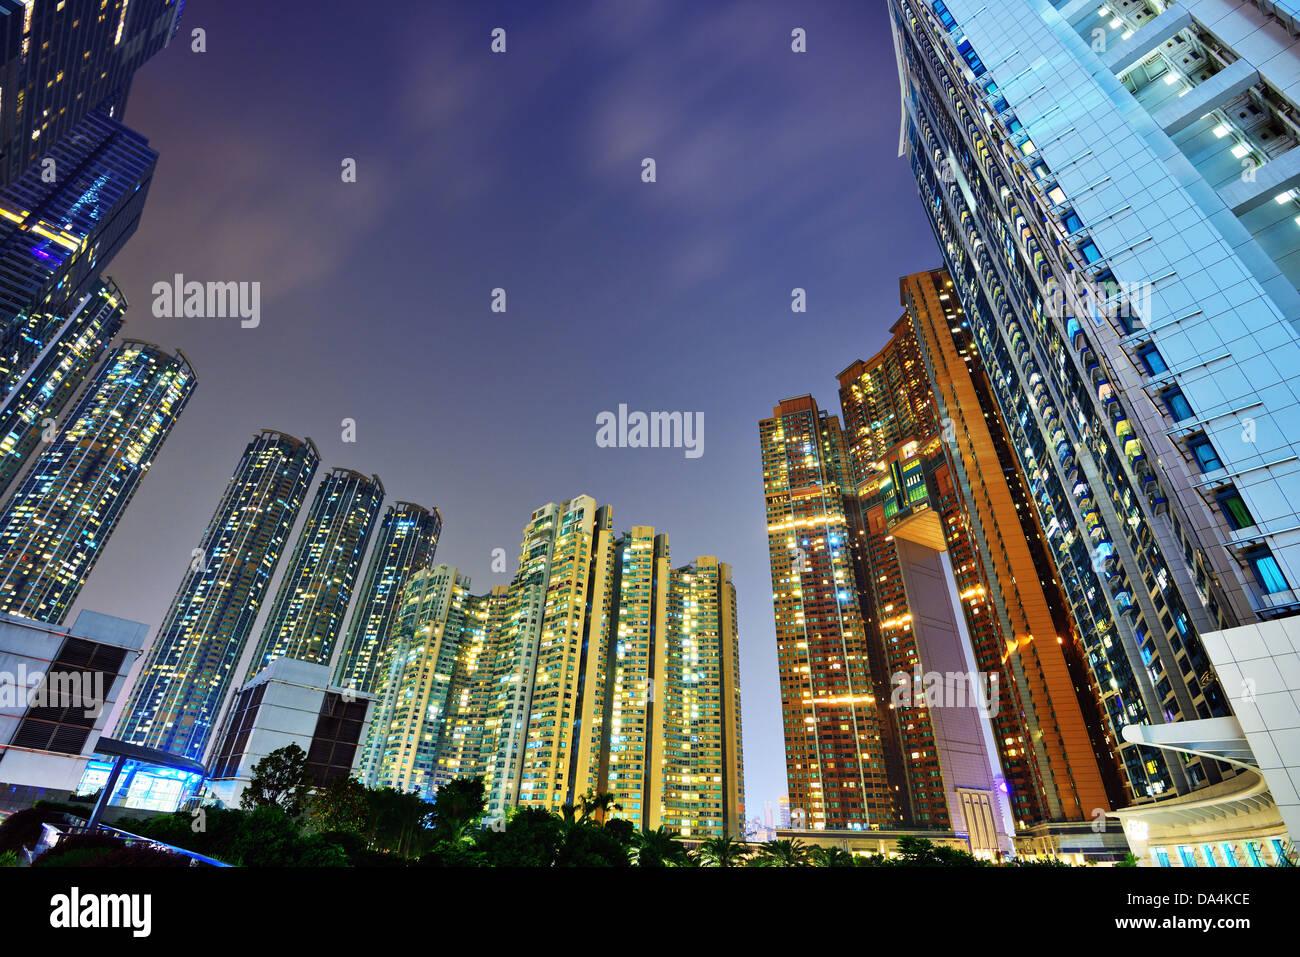 Luxury high rise apartments in Kowloon, Hong Kong SAR, China. - Stock Image